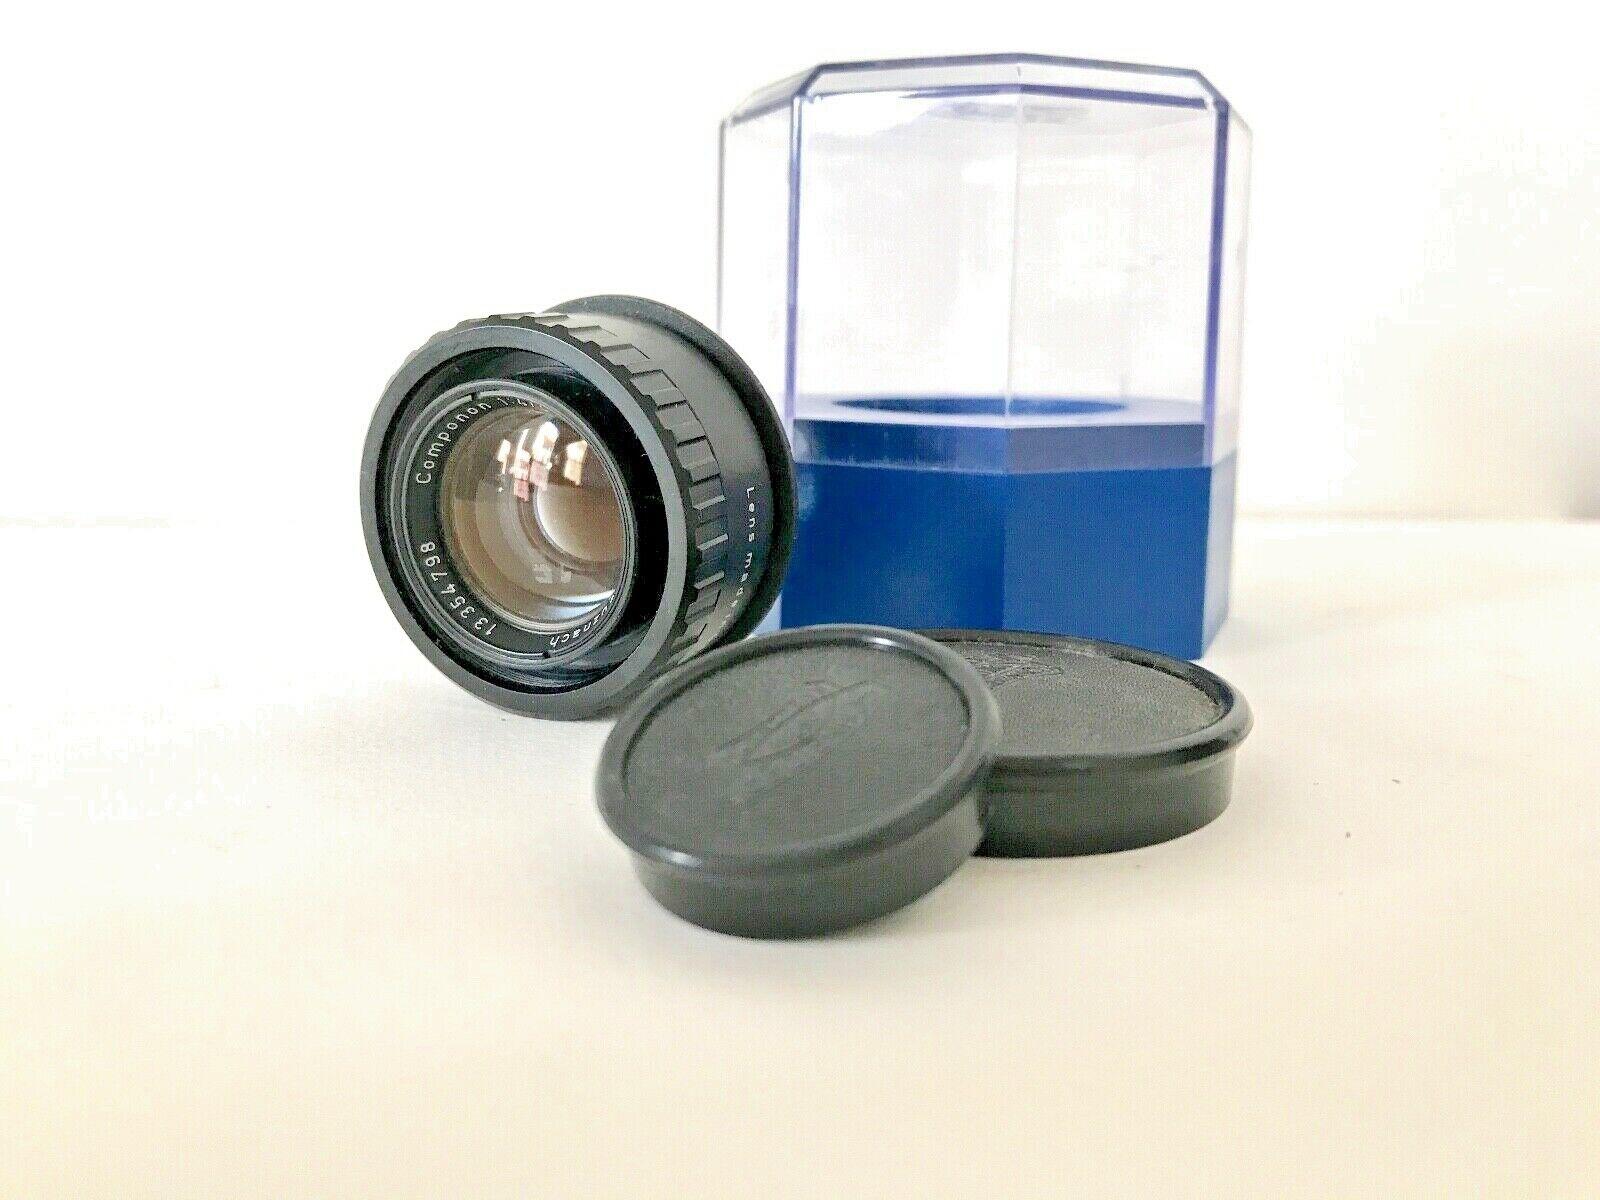 Schneider Componon 50mm F4 Enlarging Lens with Original box and lens caps